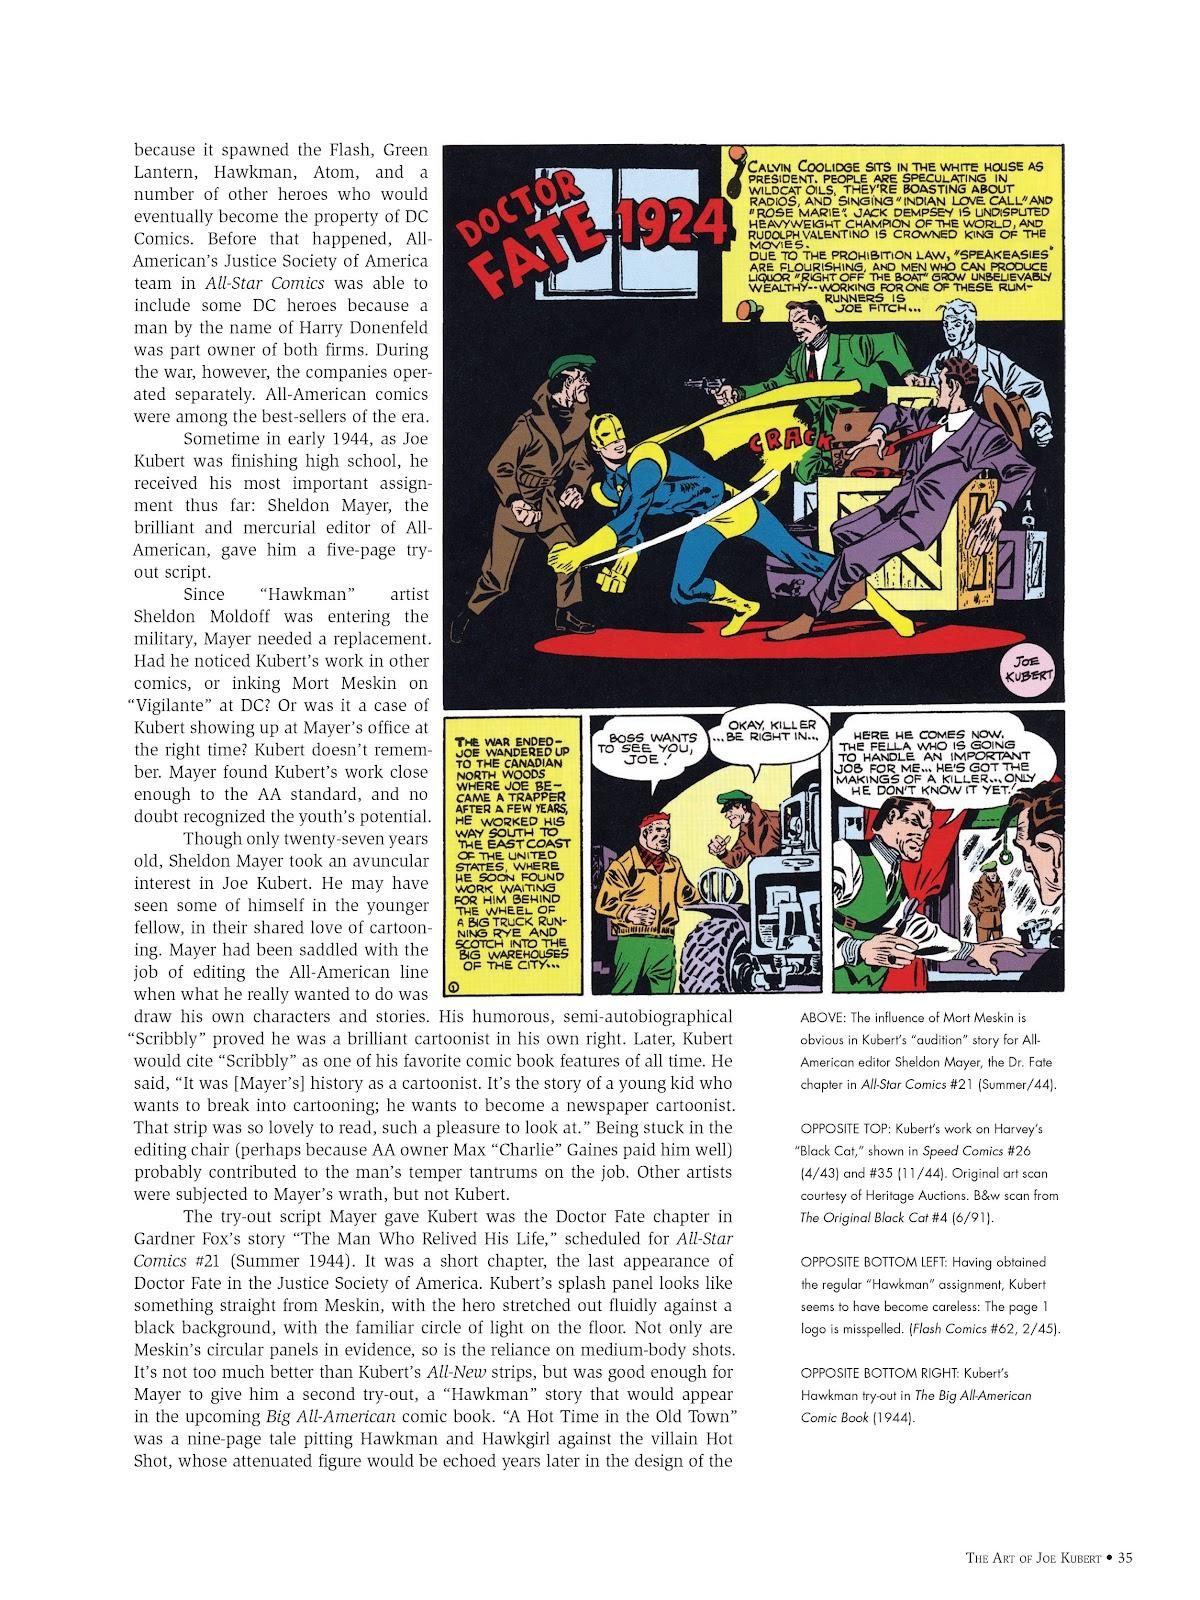 Read online The Art of Joe Kubert comic -  Issue # TPB (Part 1) - 34